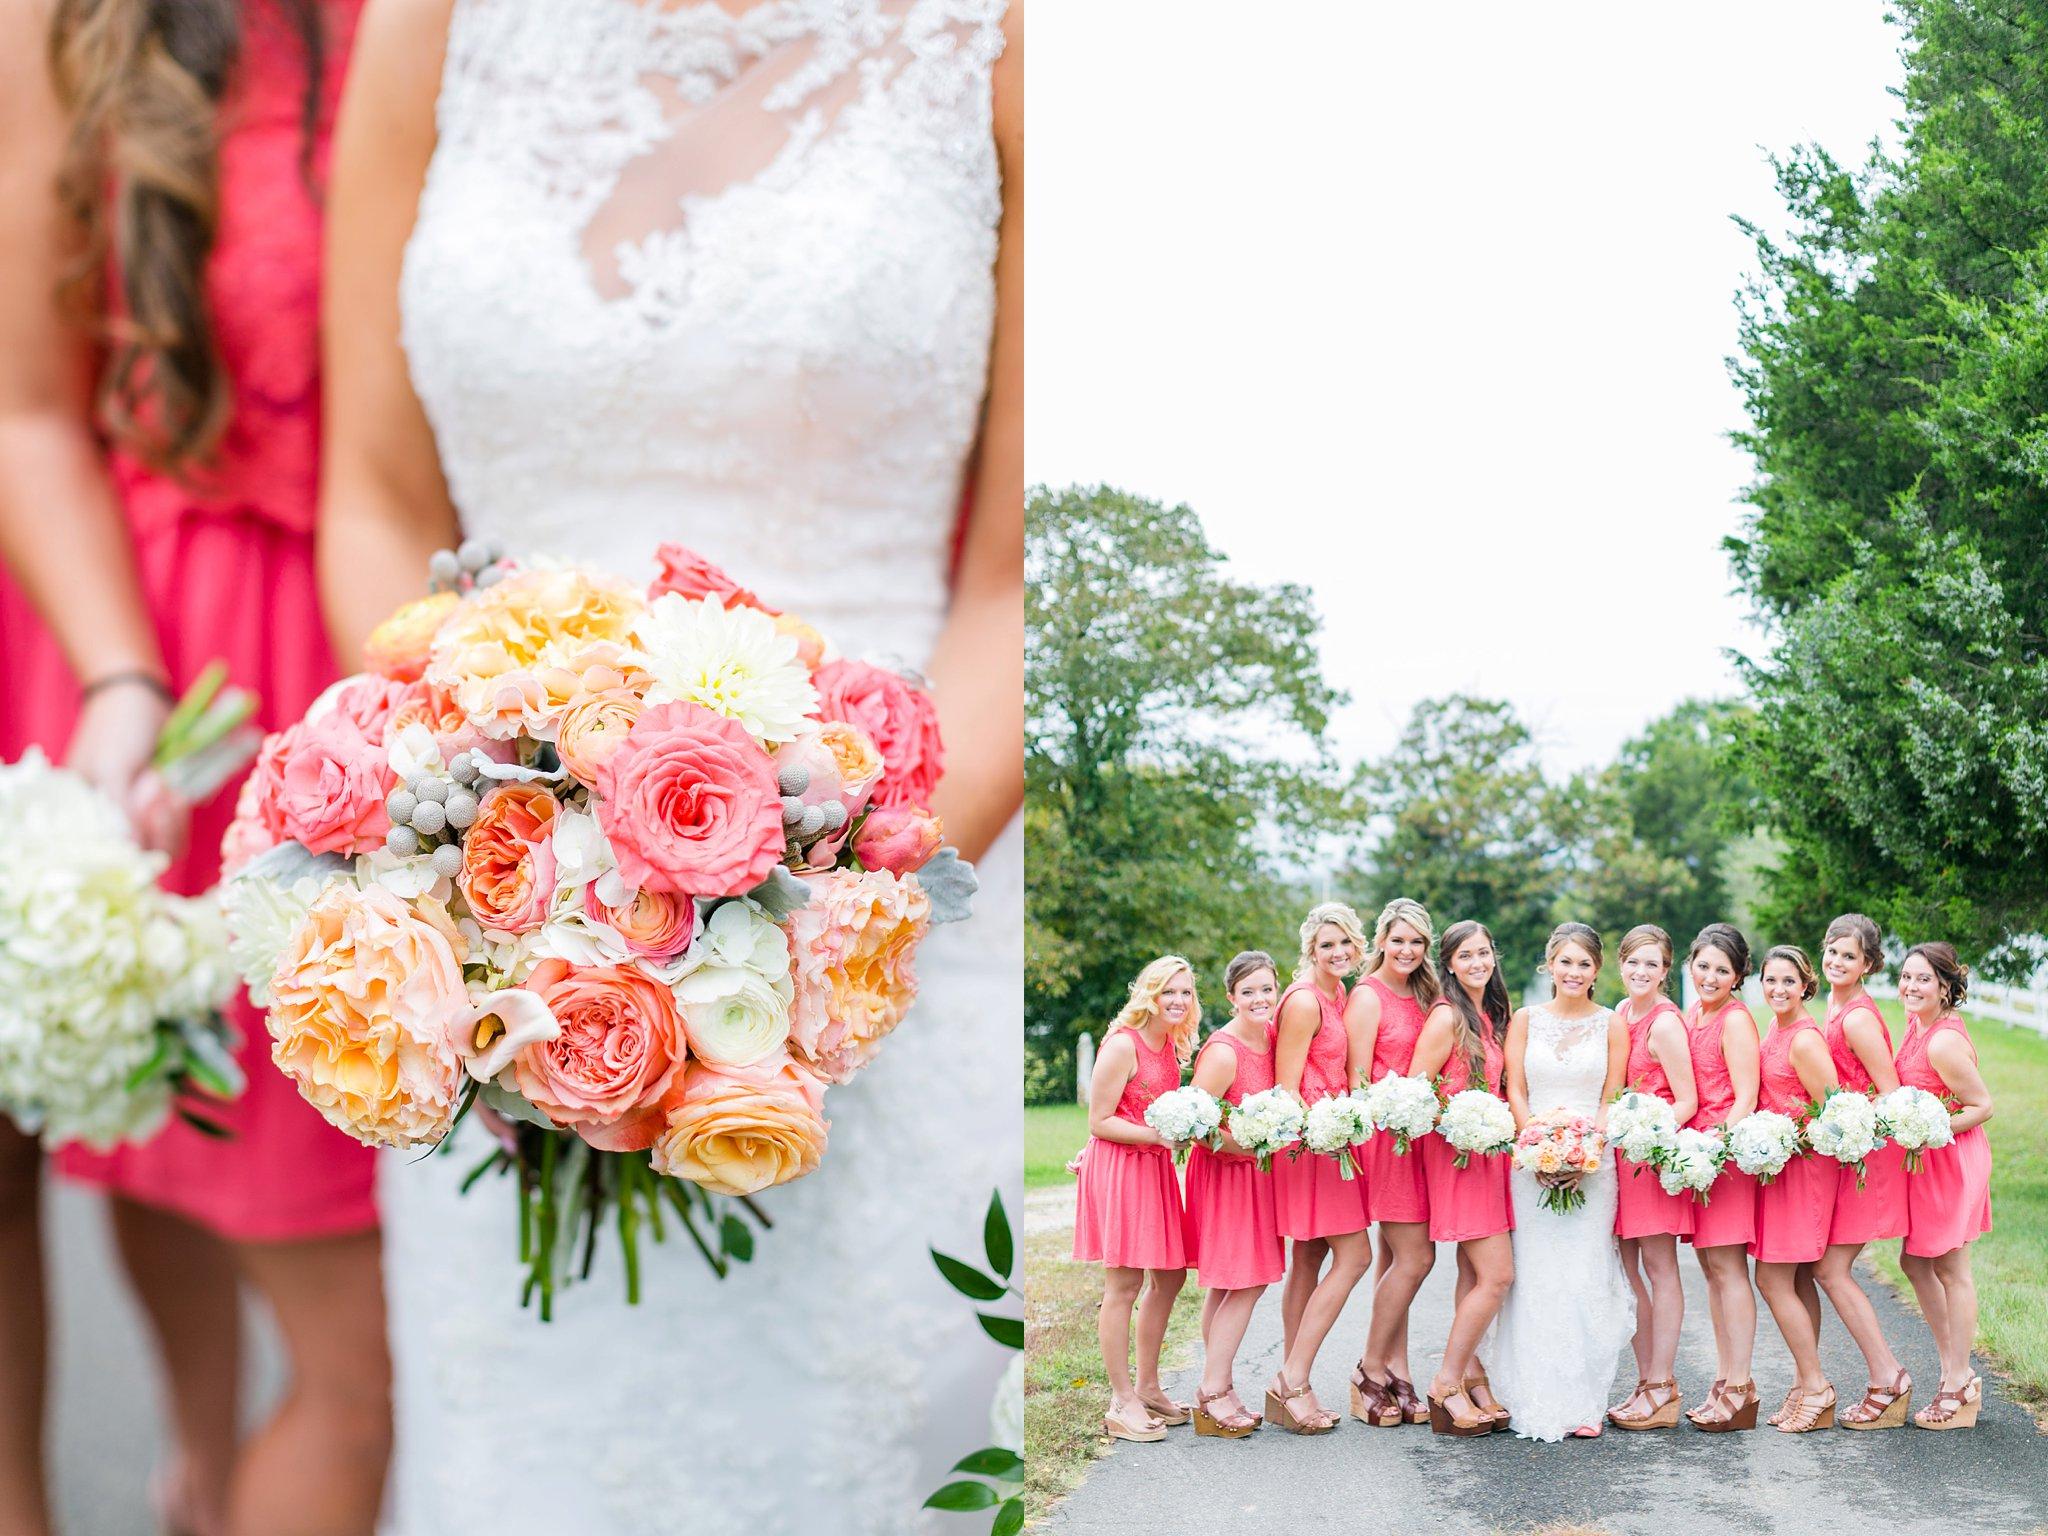 Stone Tower Winery Wedding Photos Virginia Wedding Photographer Megan Kelsey Photography Sam & Angela-68.jpg